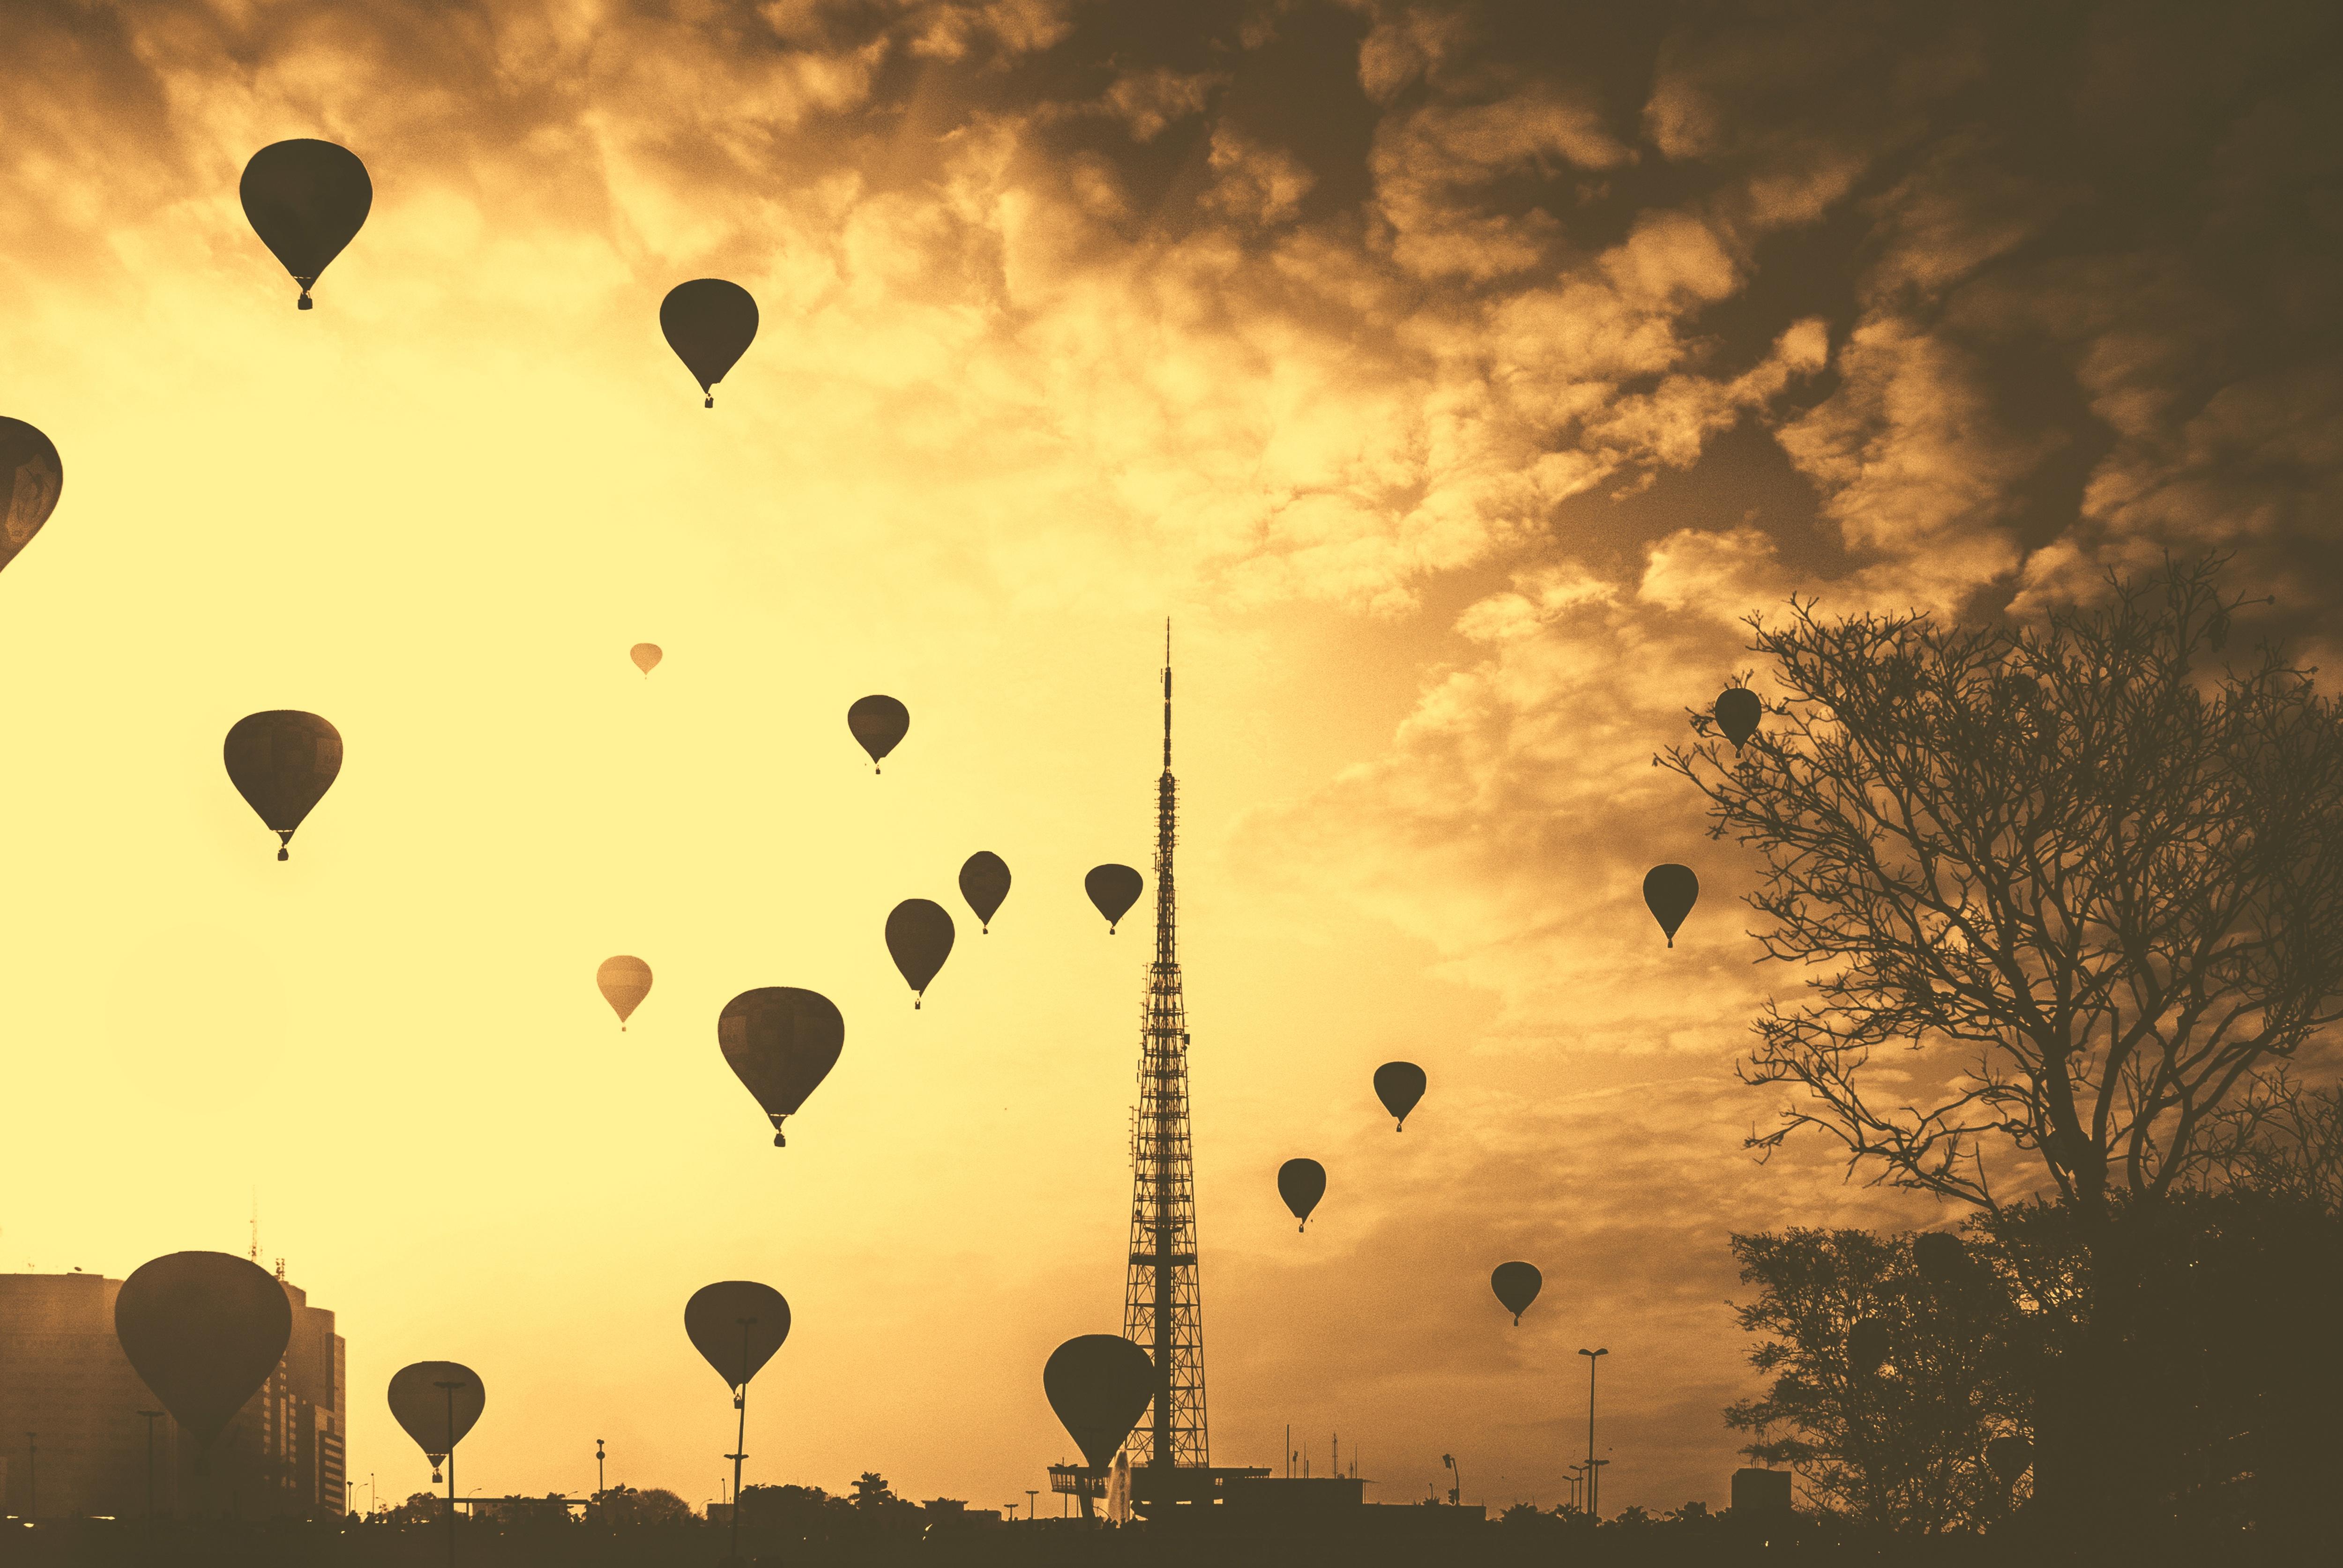 Hot Air Balloons, Air, Balloons, Buildings, City, HQ Photo